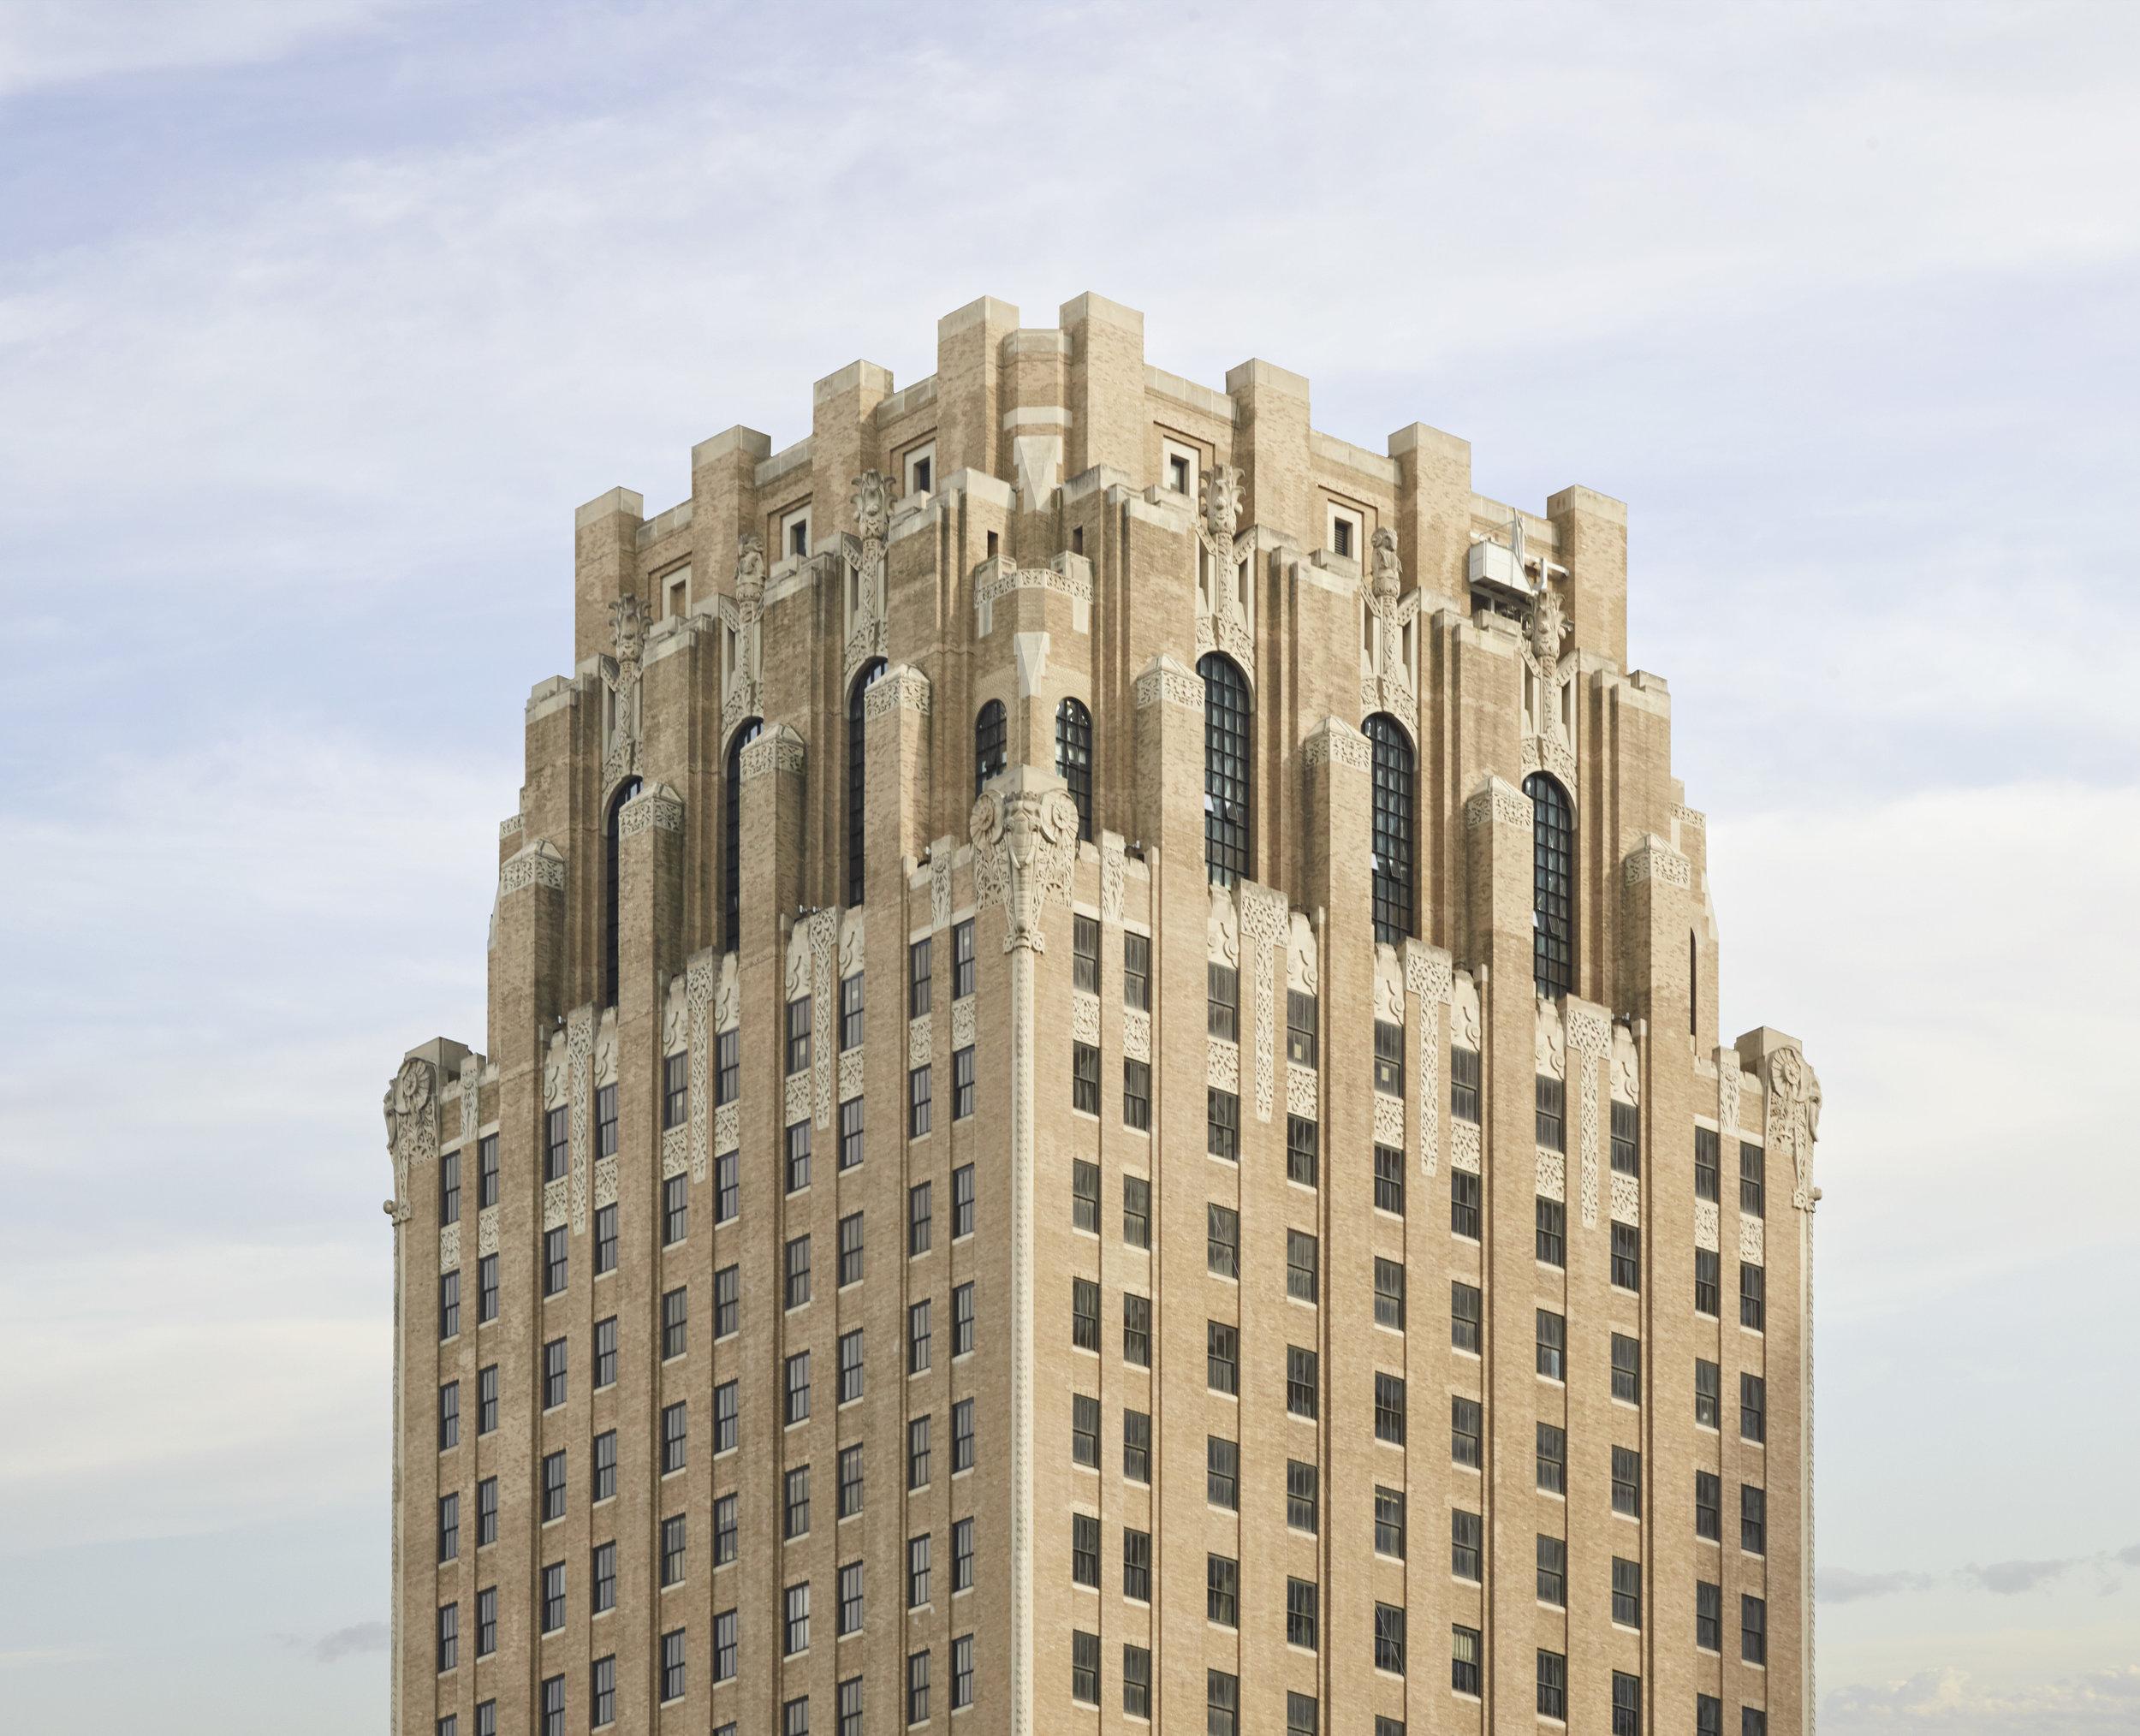 Inside One Hundred Barclay, The Original New York Telephone Company Headquarters Condo Conversion